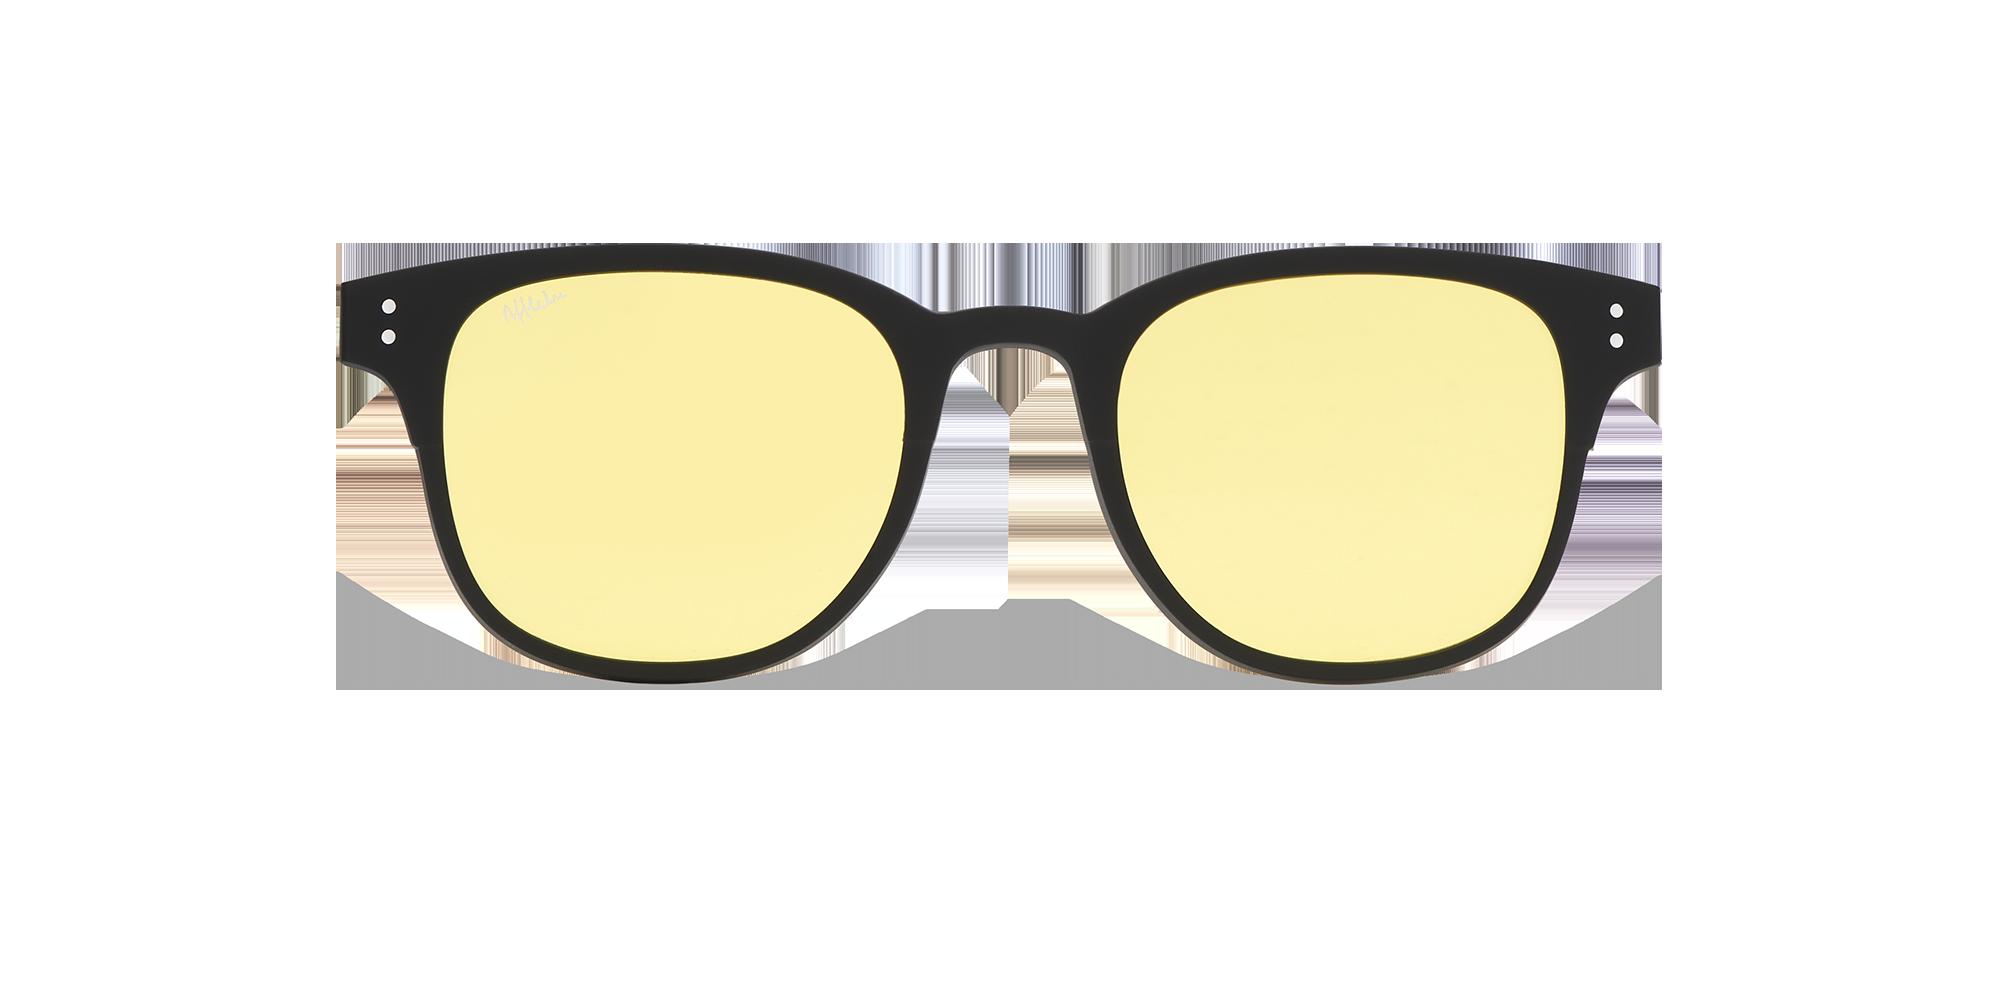 afflelou/france/products/smart_clip/clips_glasses/TMK34YEBK015021.png